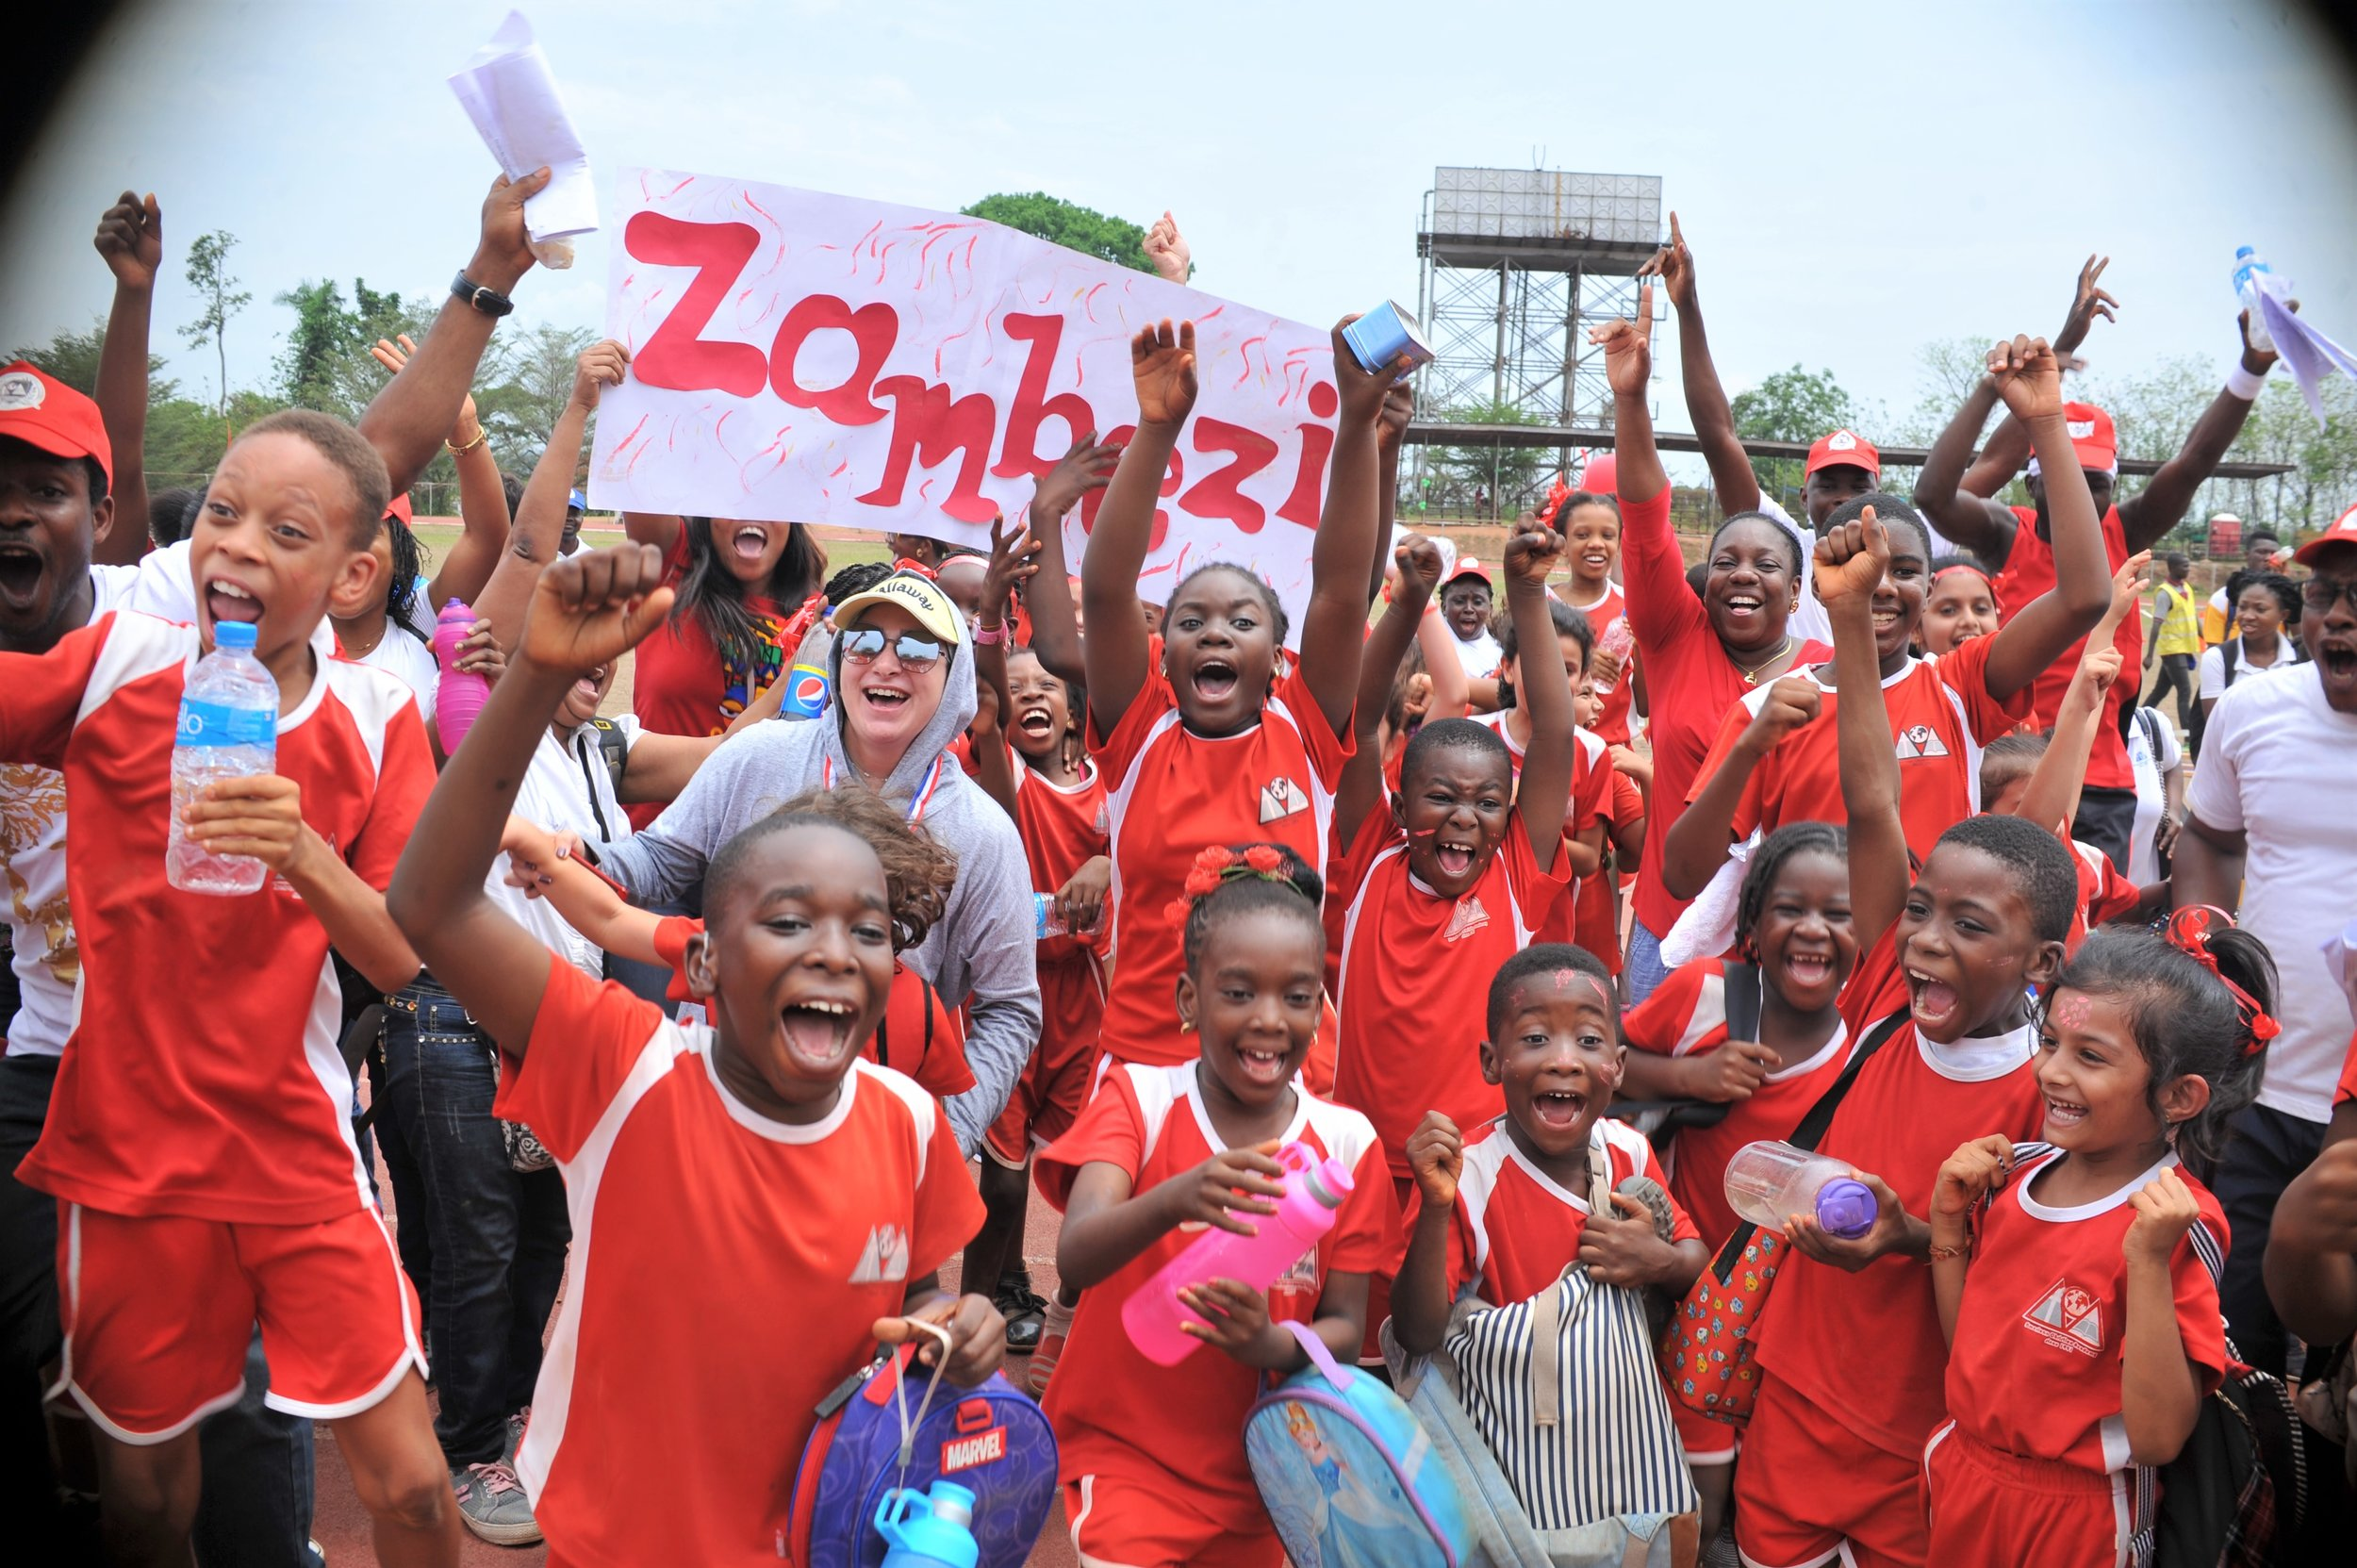 Zambezi! ACA Sport Daze Winners